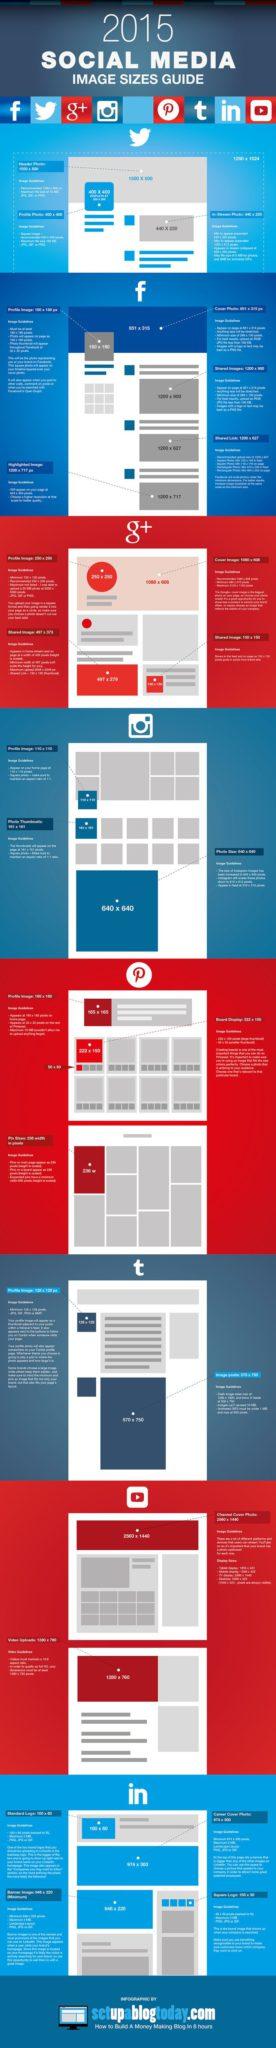 Redes sociales, imagenes, tamaño, Twitter, Facebook, Pinterest,